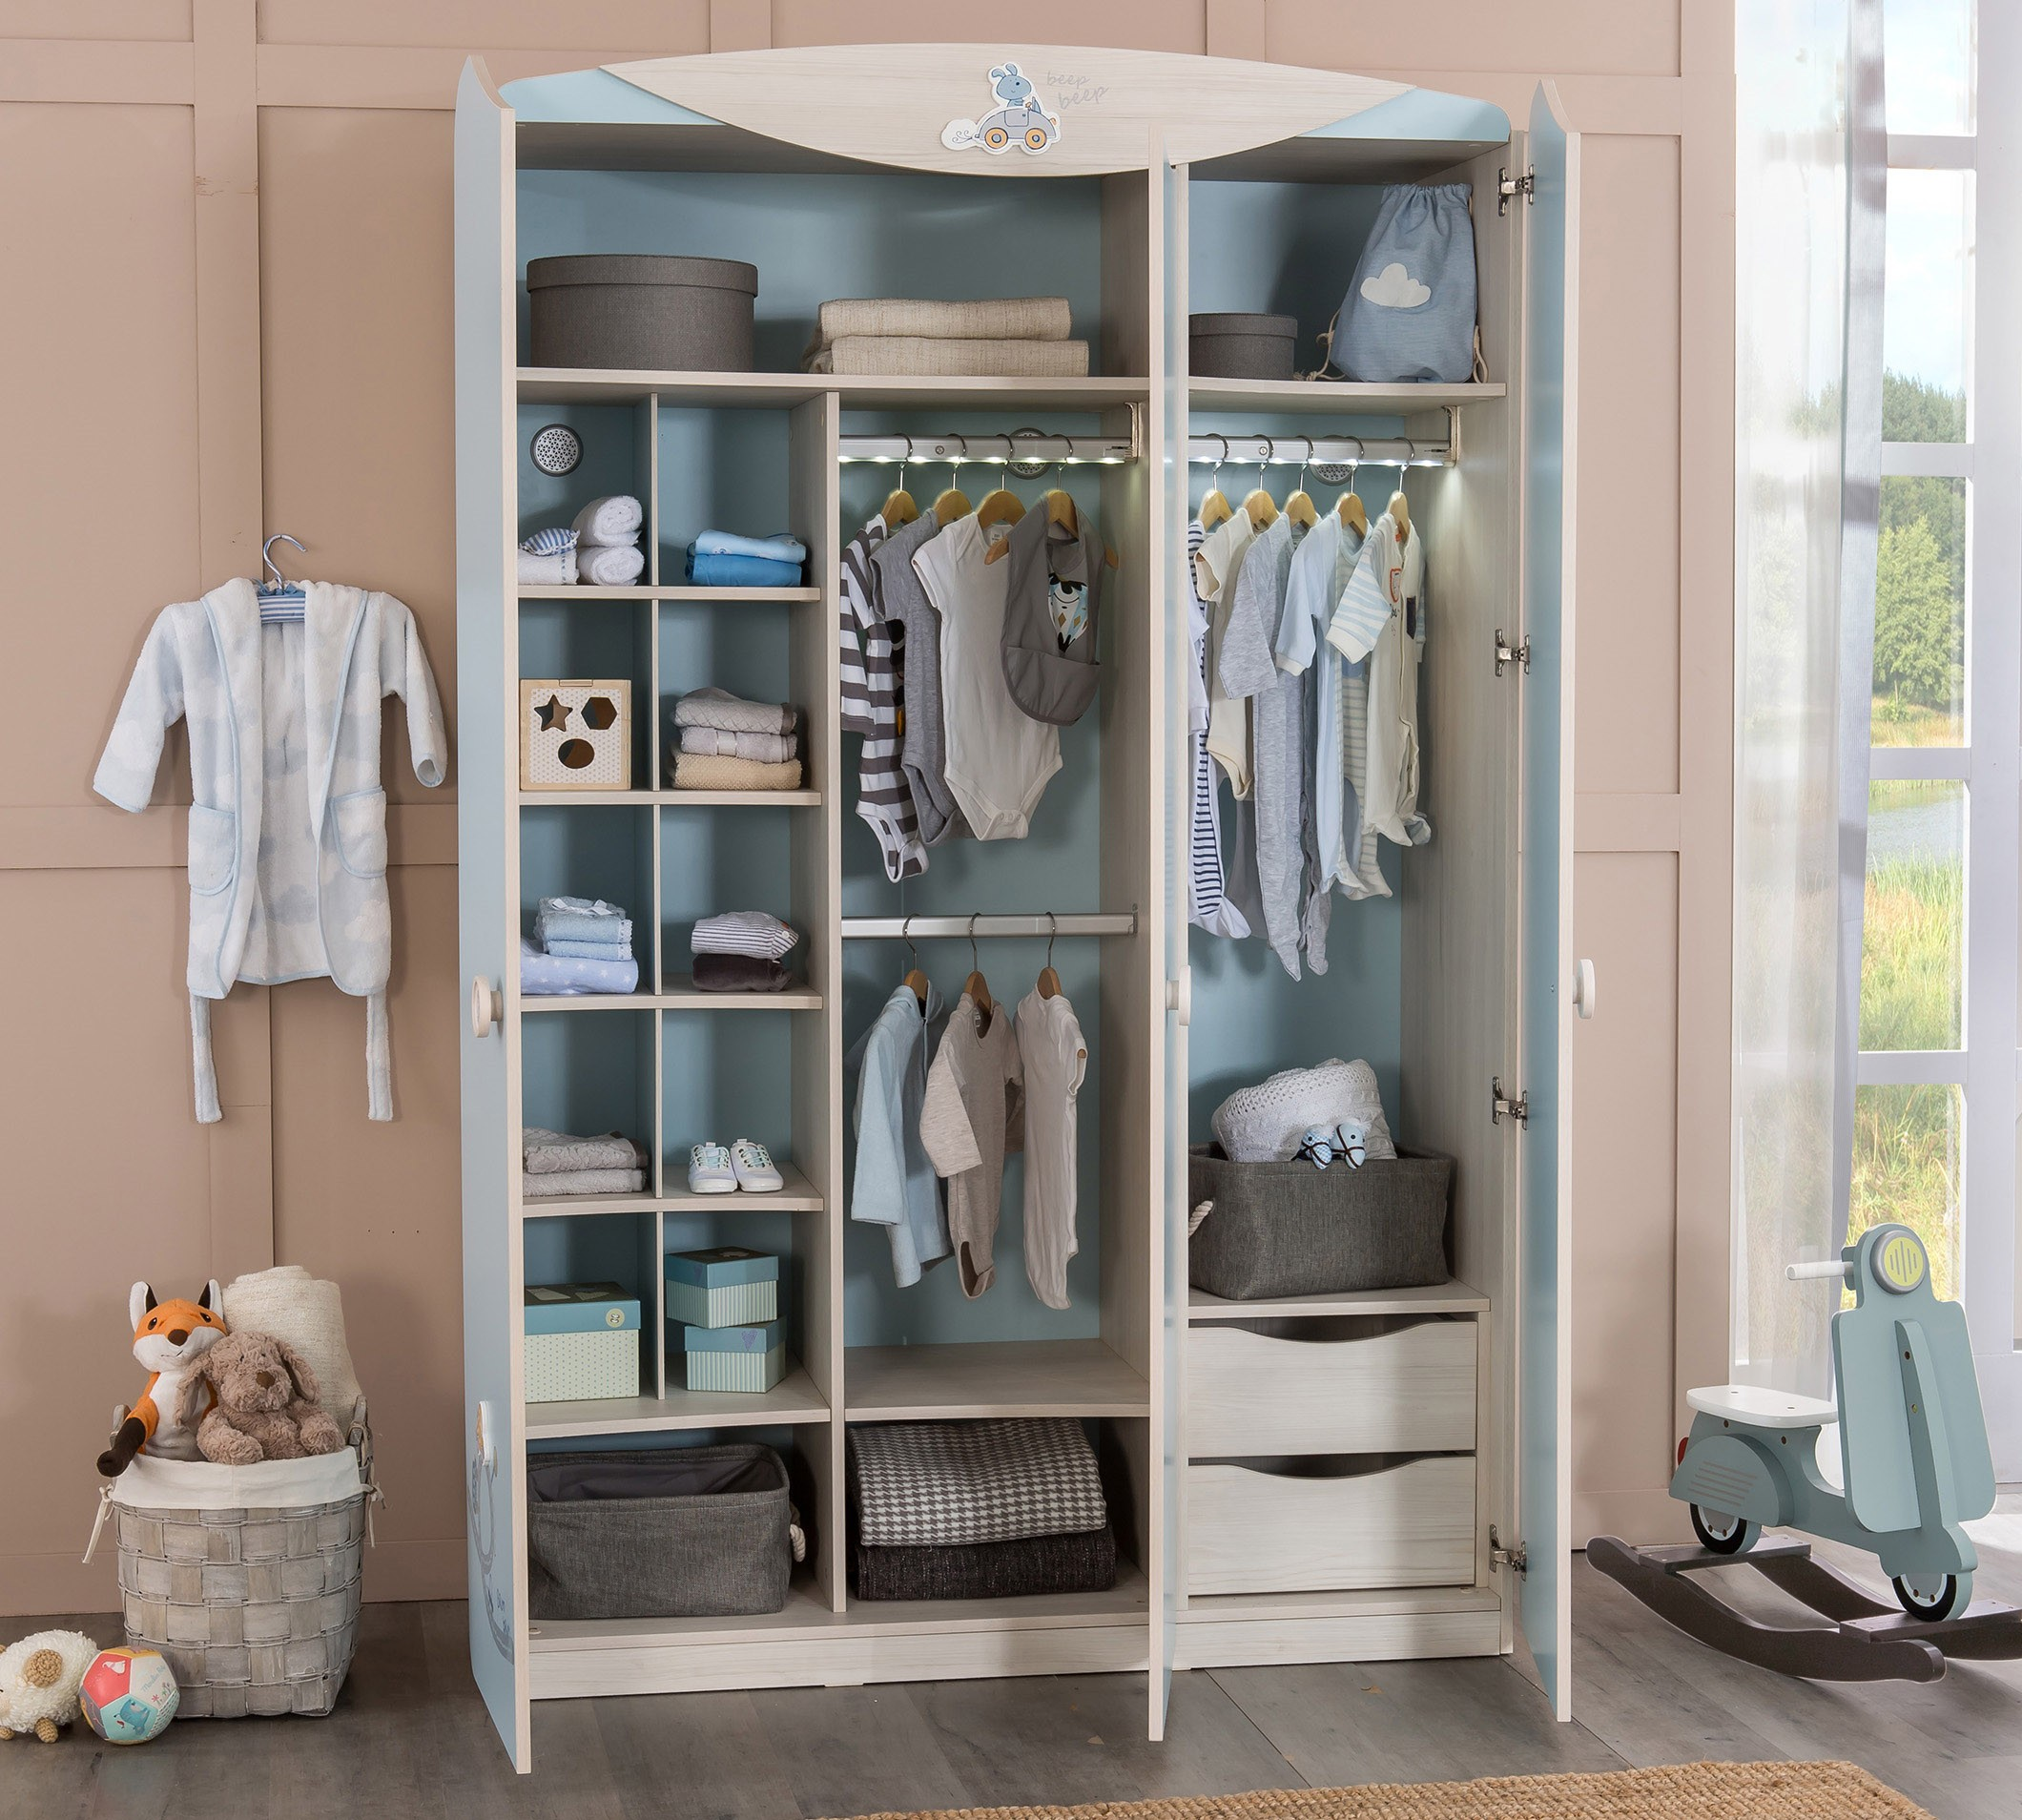 babykamer blauw kledingkast 3 deurs jongens kinderkamer kinderbed terrashaard en barbecues. Black Bedroom Furniture Sets. Home Design Ideas